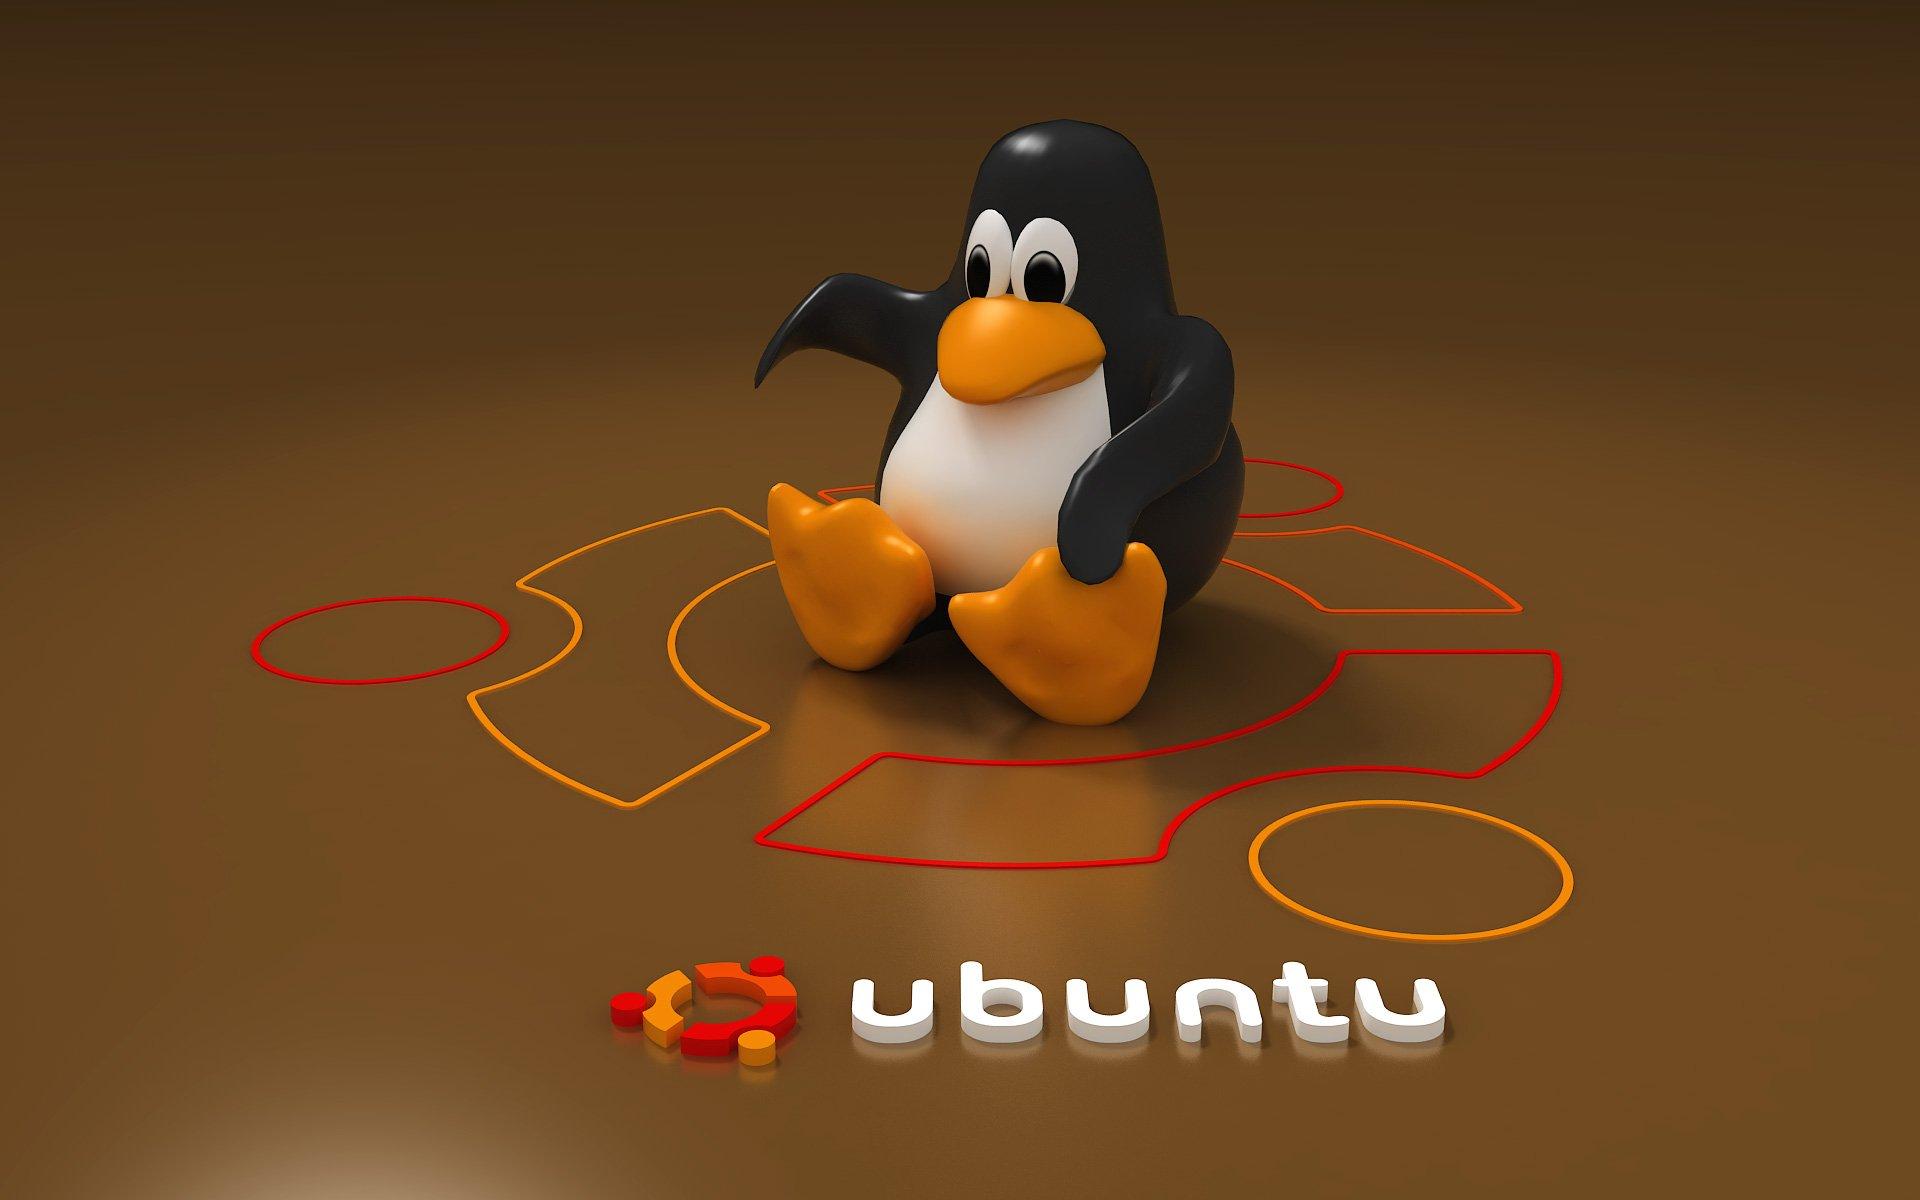 Ubuntu 12 stream на ubuntu без использования репозитория